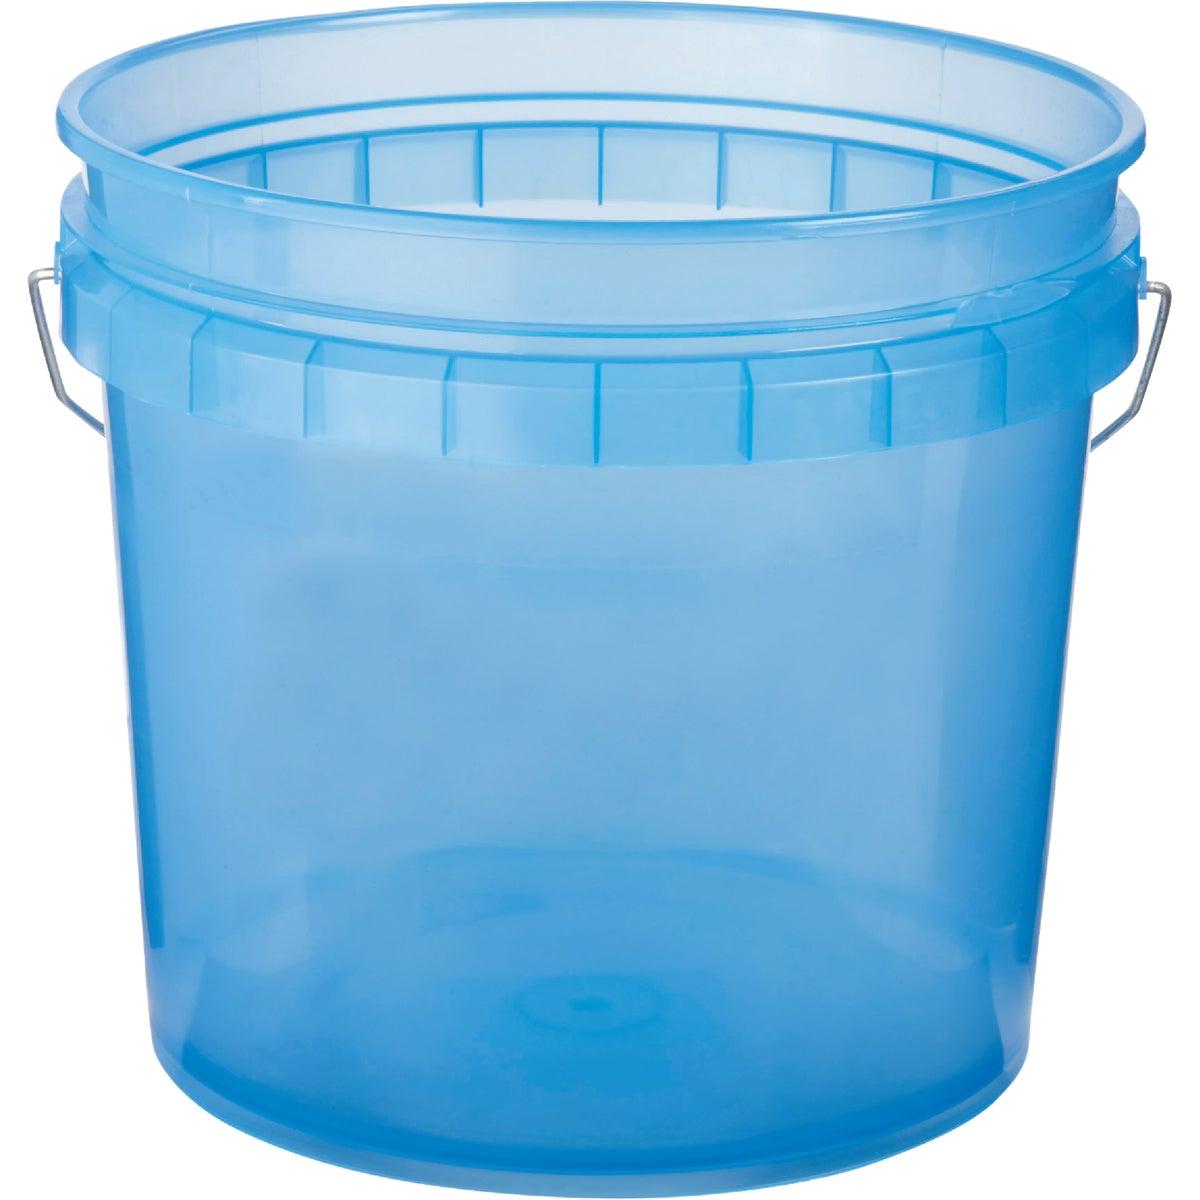 3.5GAL BLUE PLASTIC PAIL